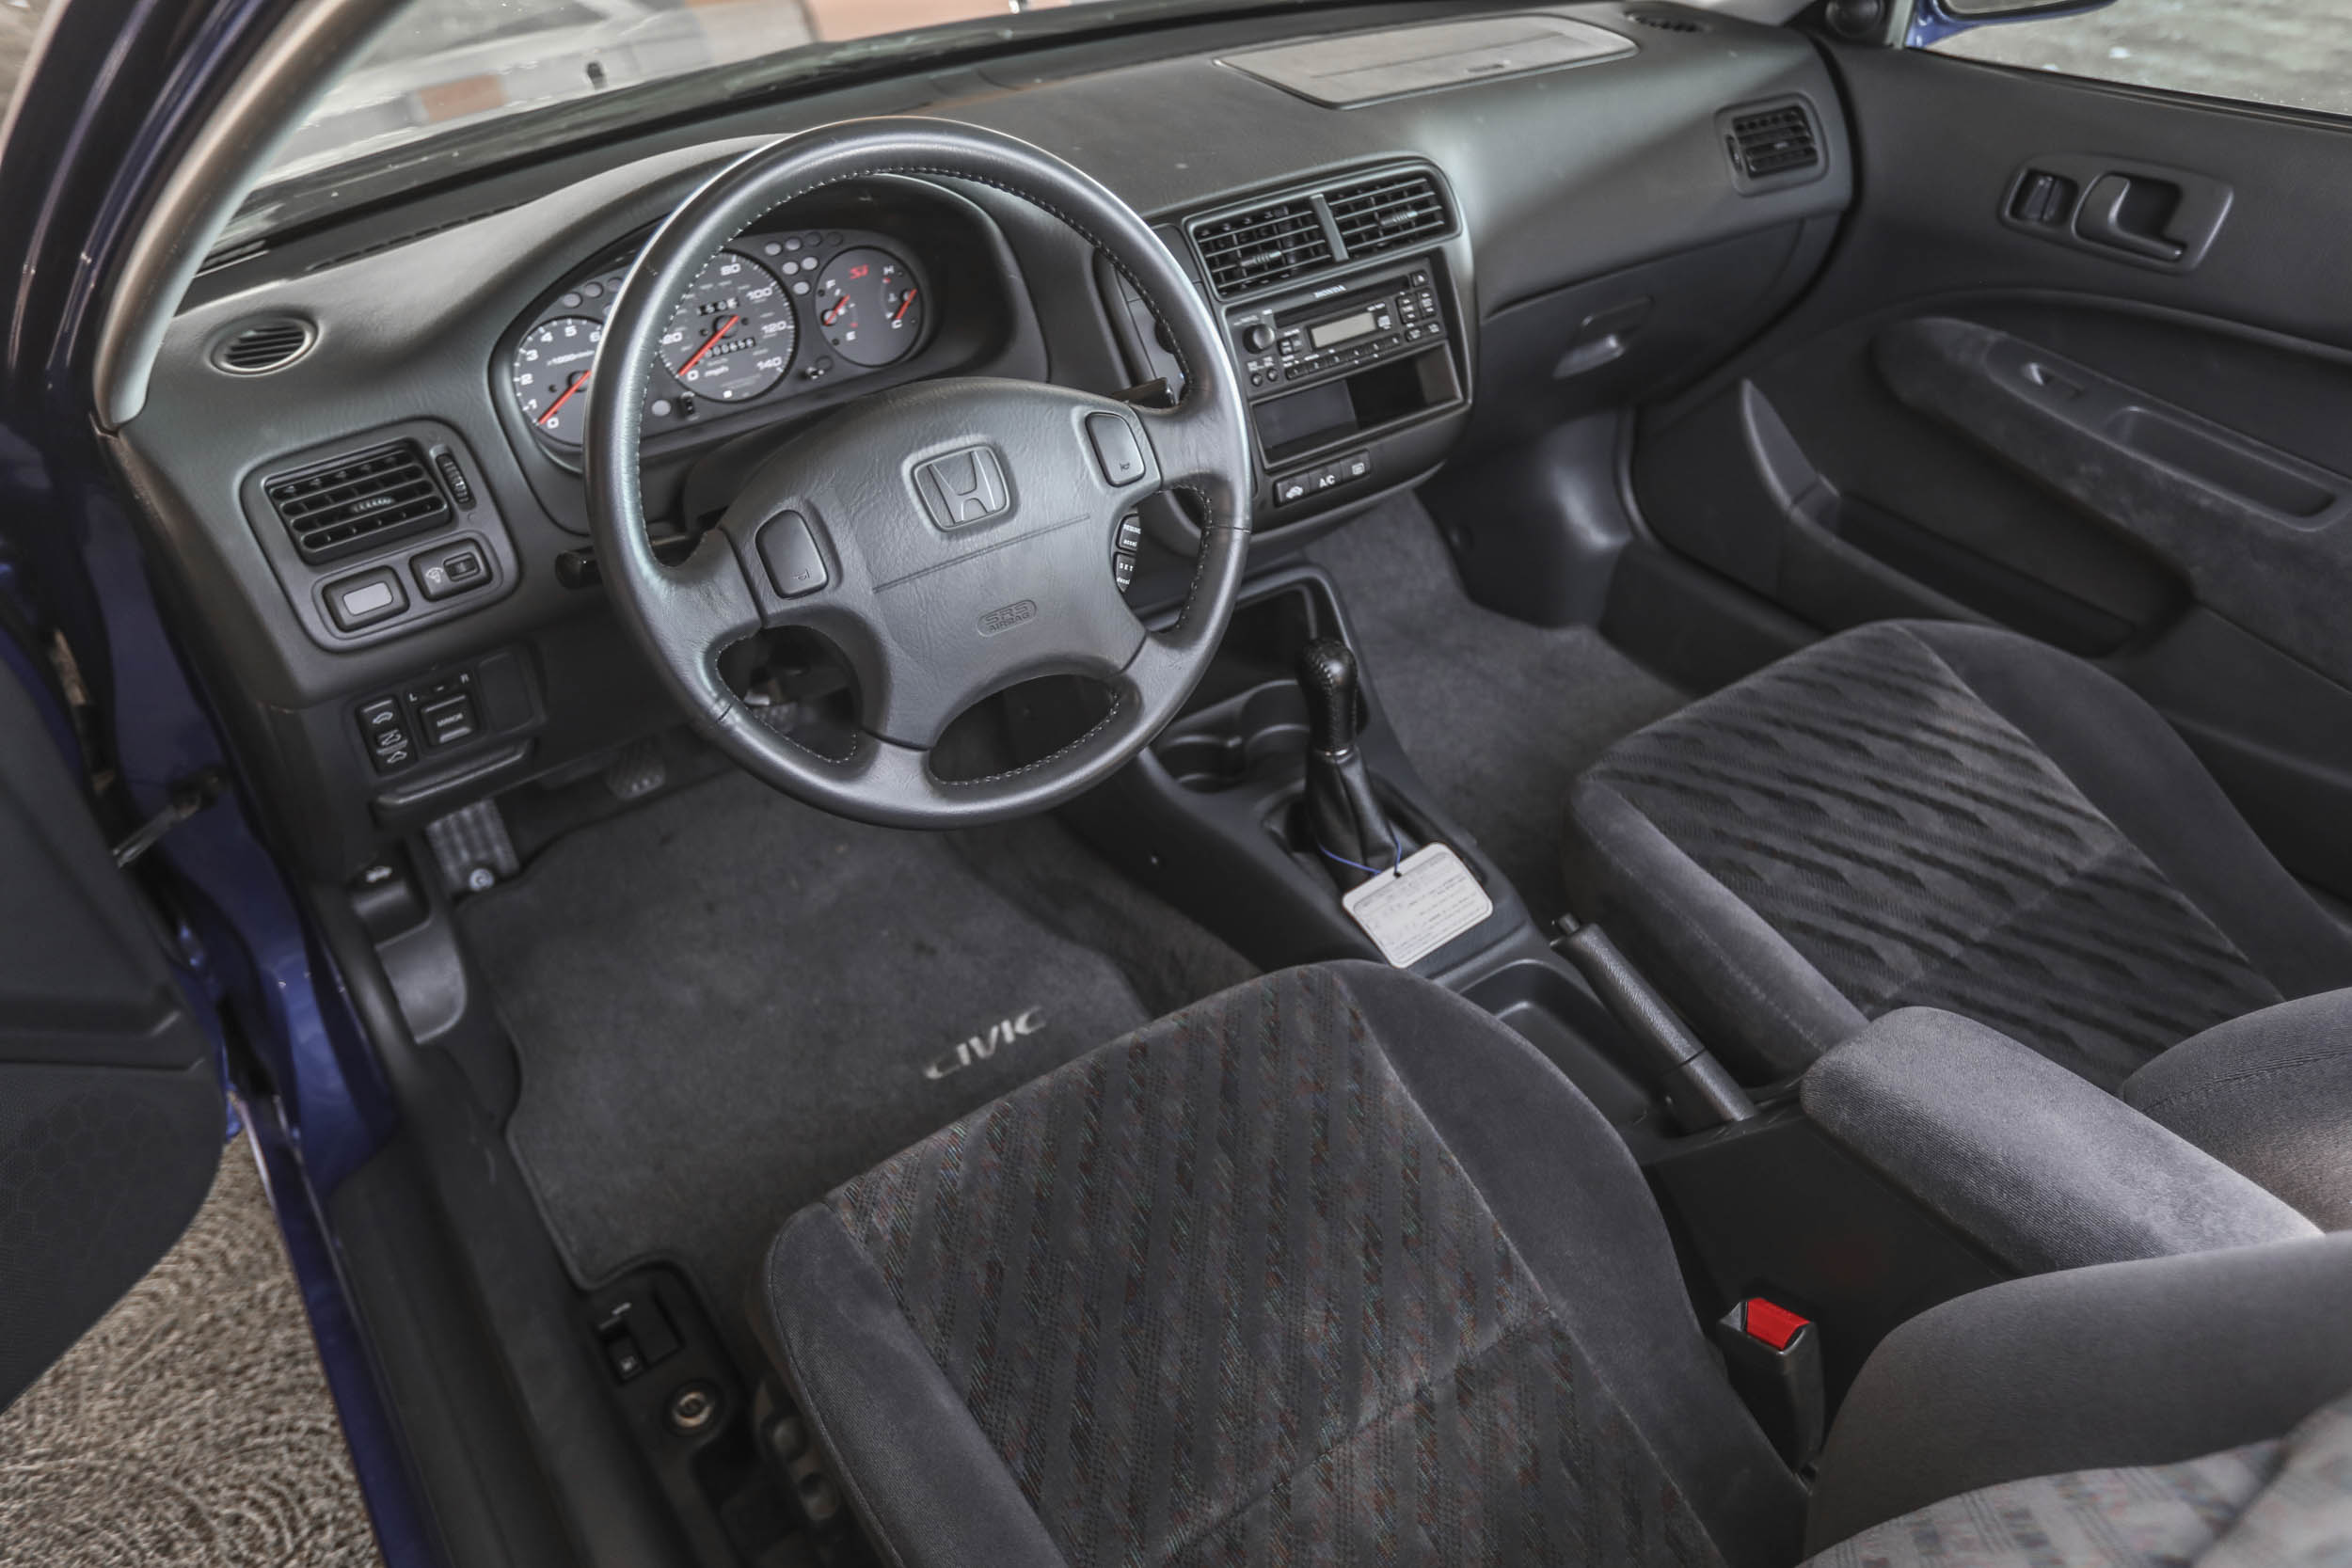 1999 Honda Civic Si interior